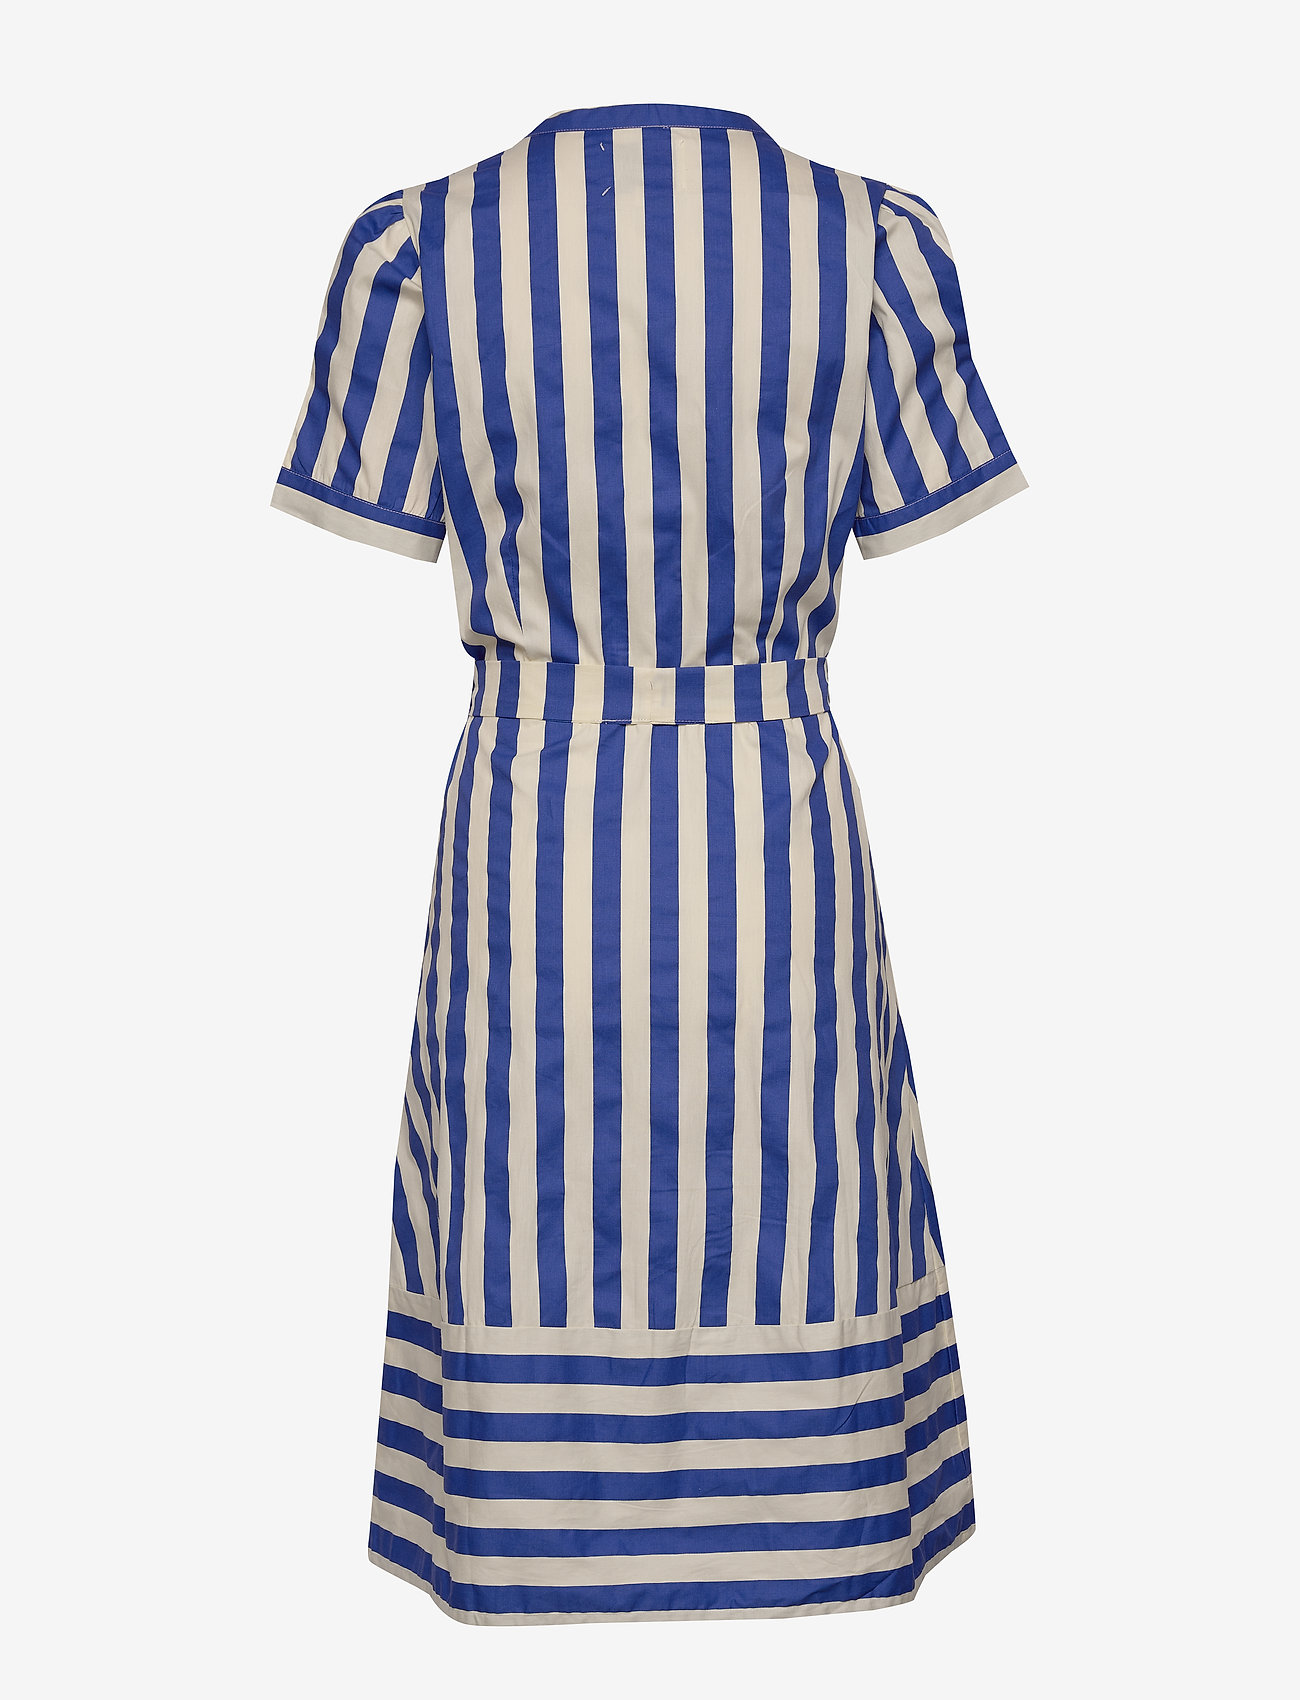 Lollys Laundry Circus Dress - Dresses